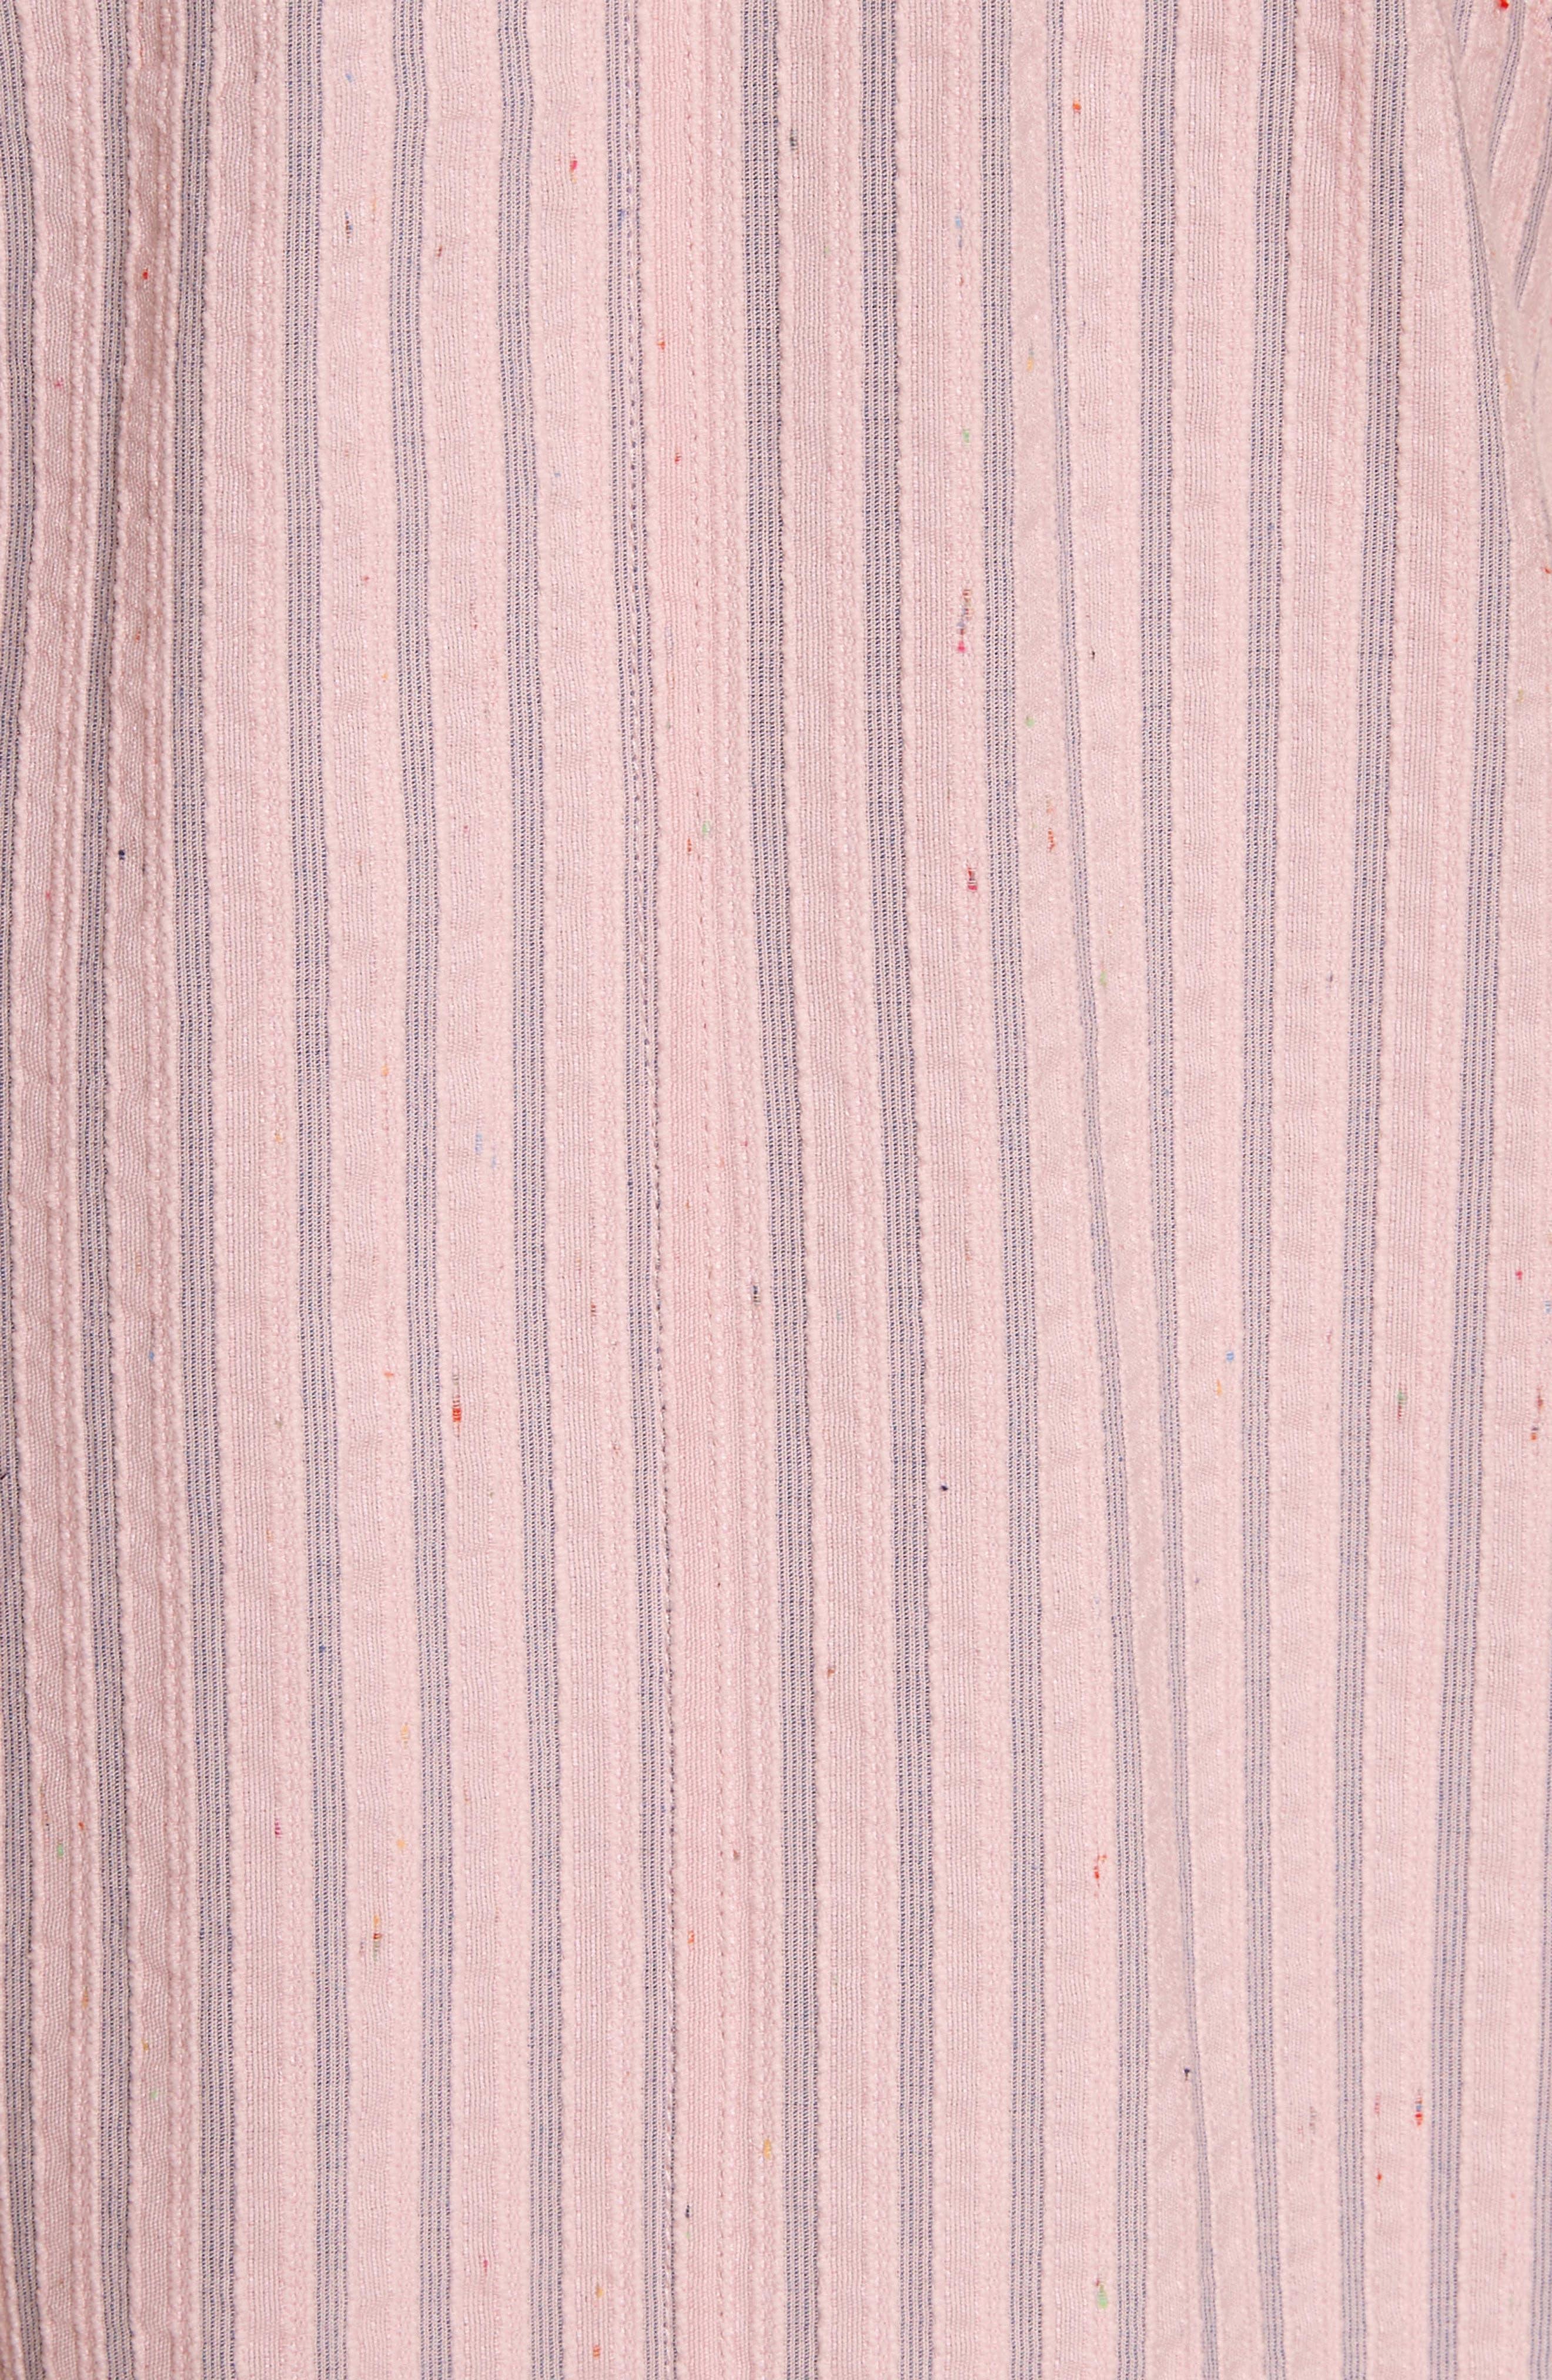 Sleeveless Stripe Tank Dress,                             Alternate thumbnail 5, color,                             Candy Floss Combo